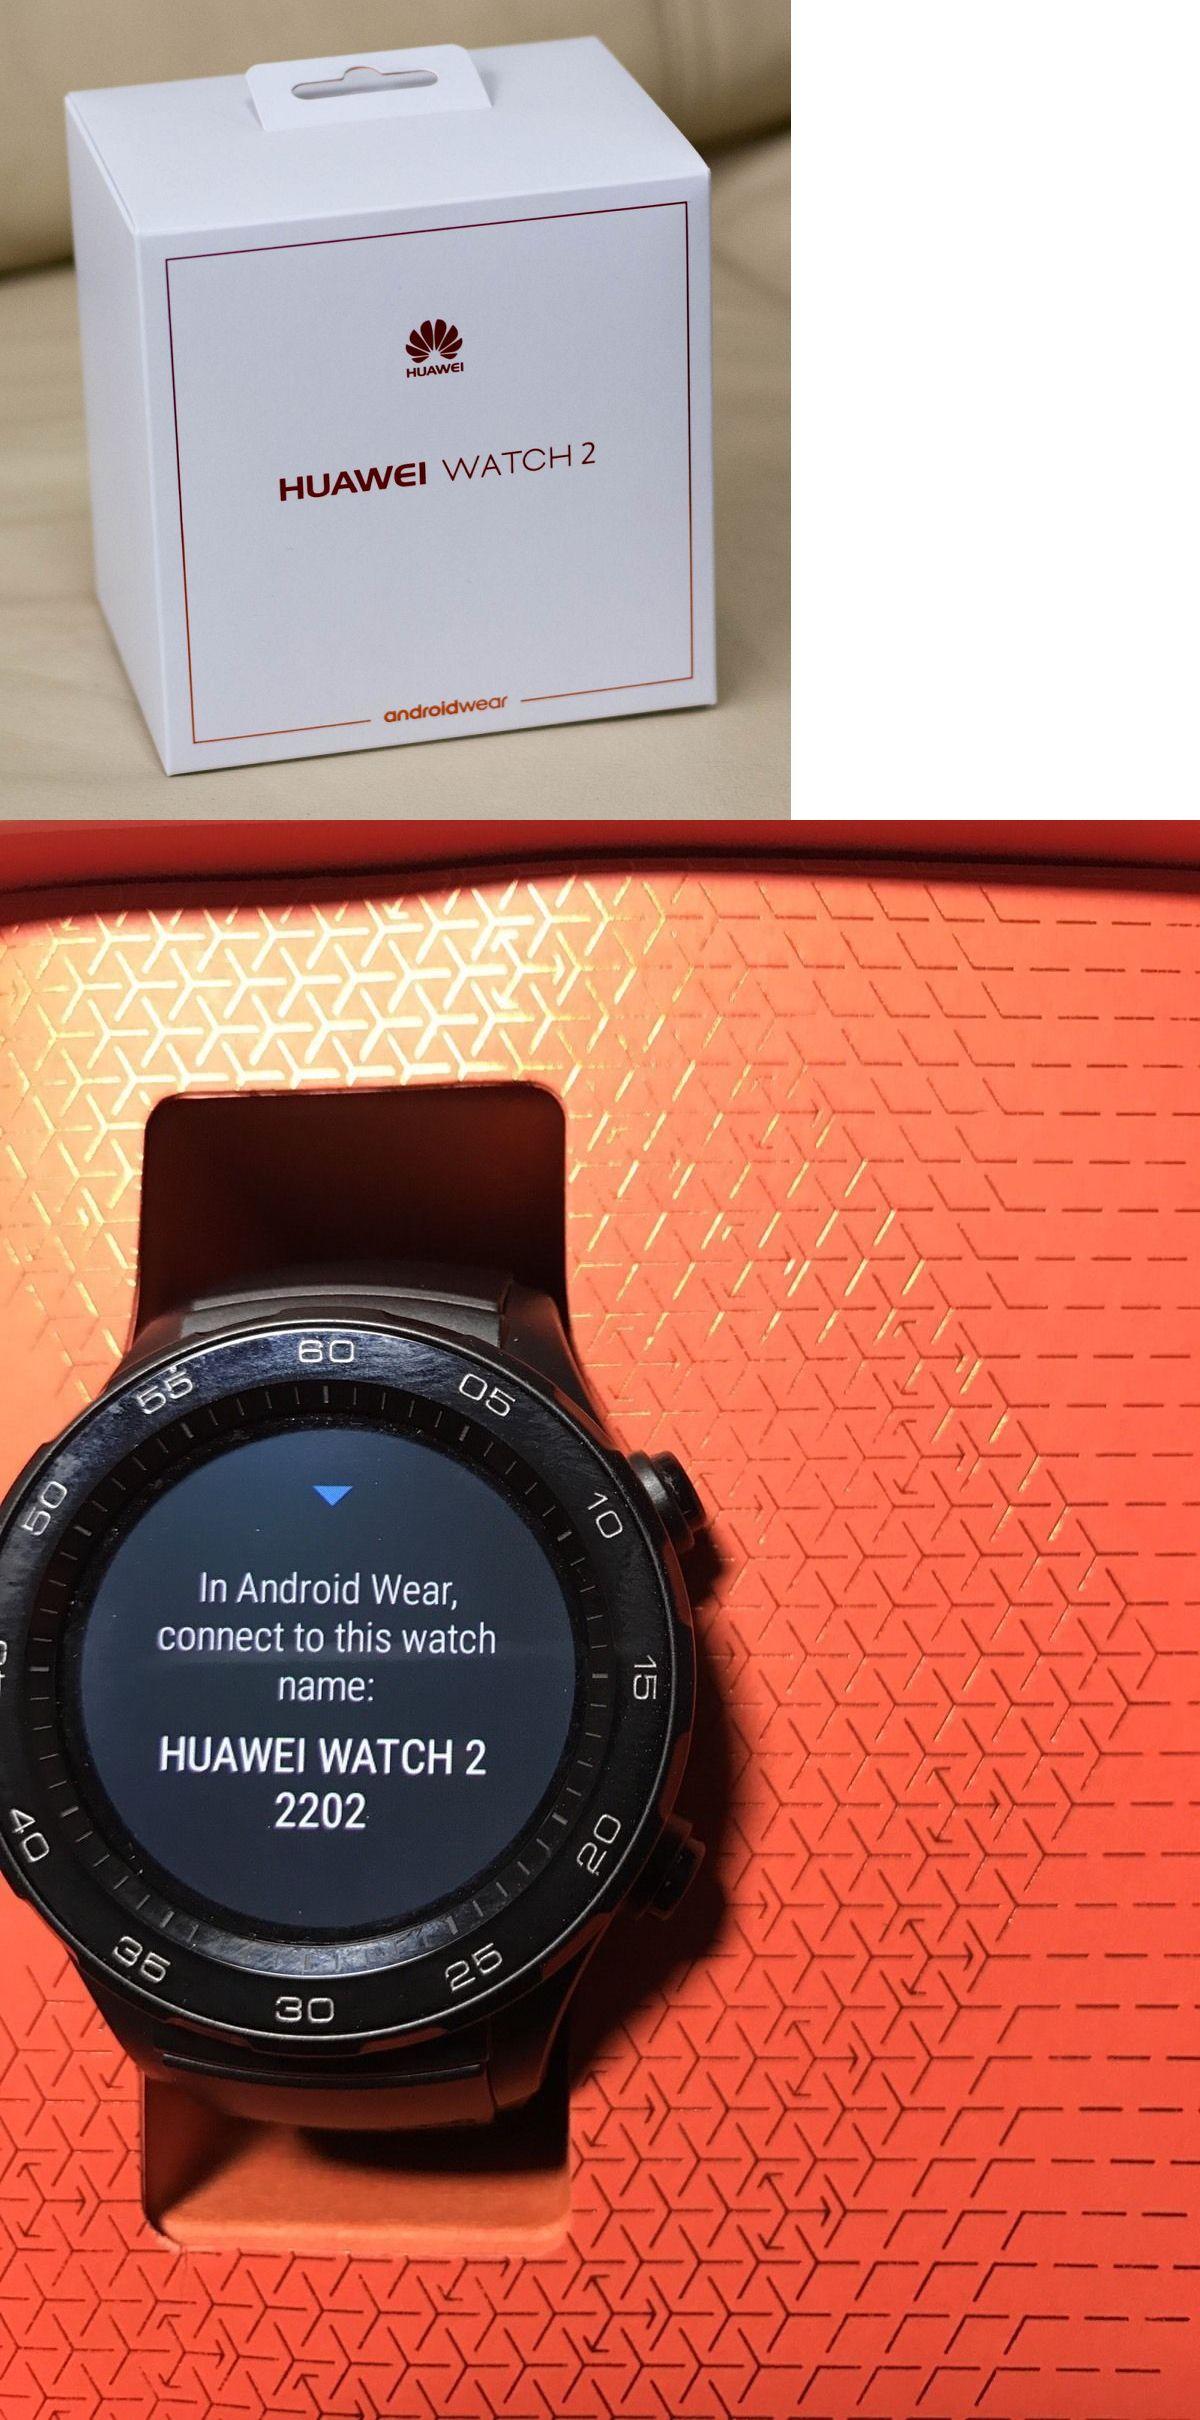 Smart Watches 178893: Huawei Watch 2 Smartwatch For